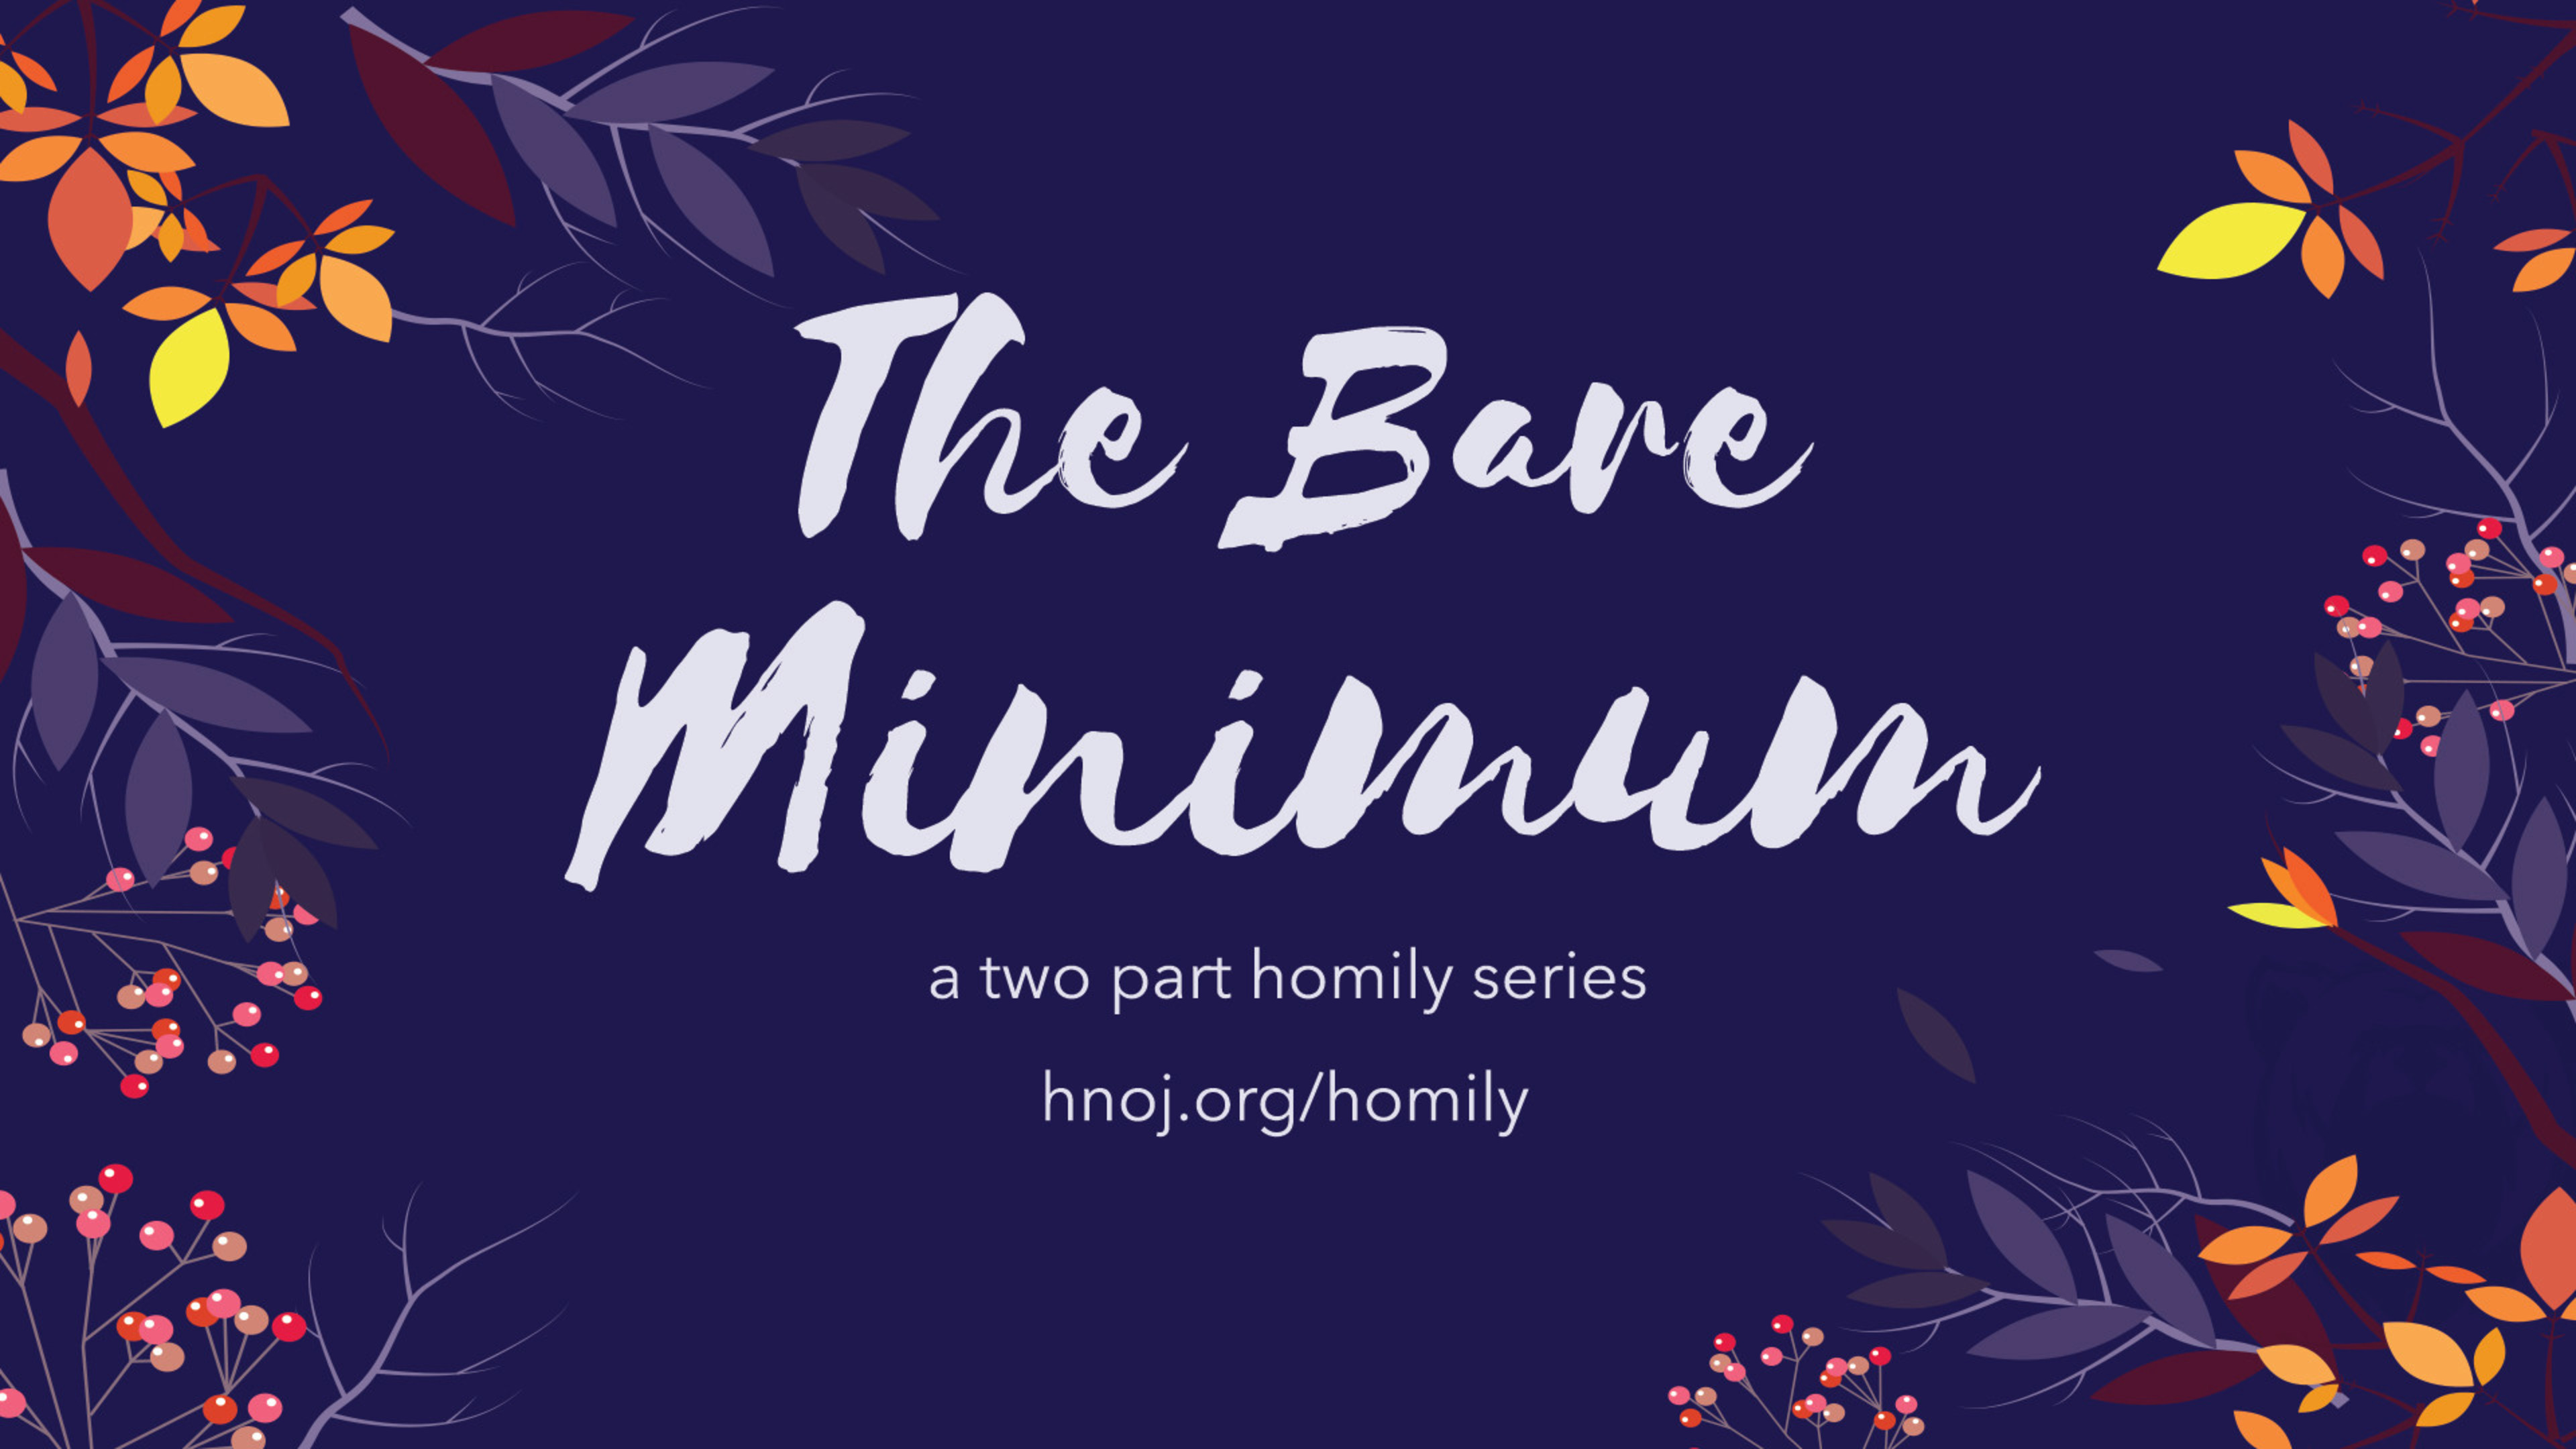 The Bare Minimum Homily Series